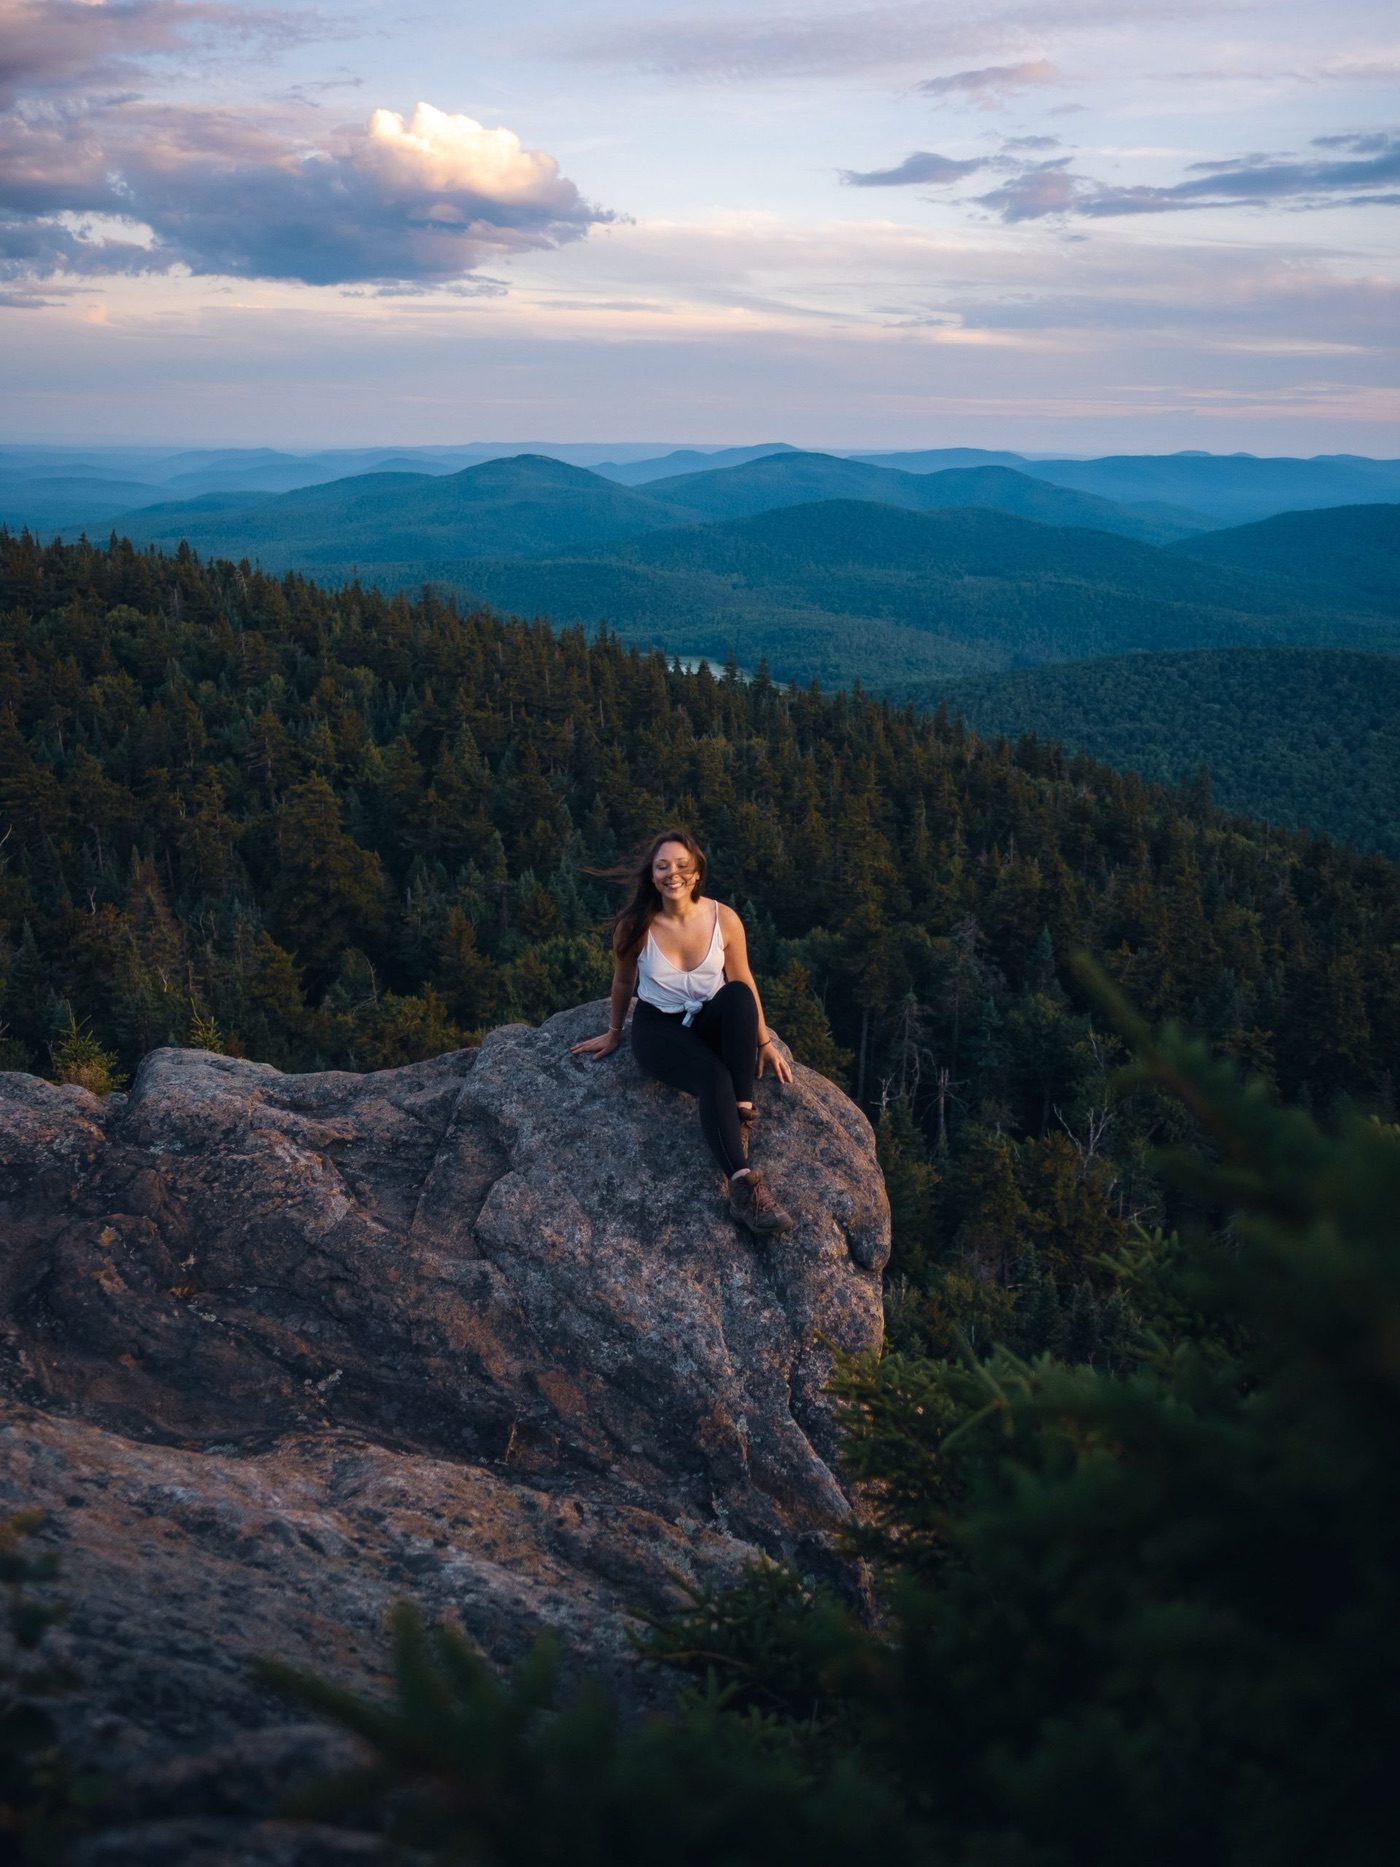 crane mountain at sunset